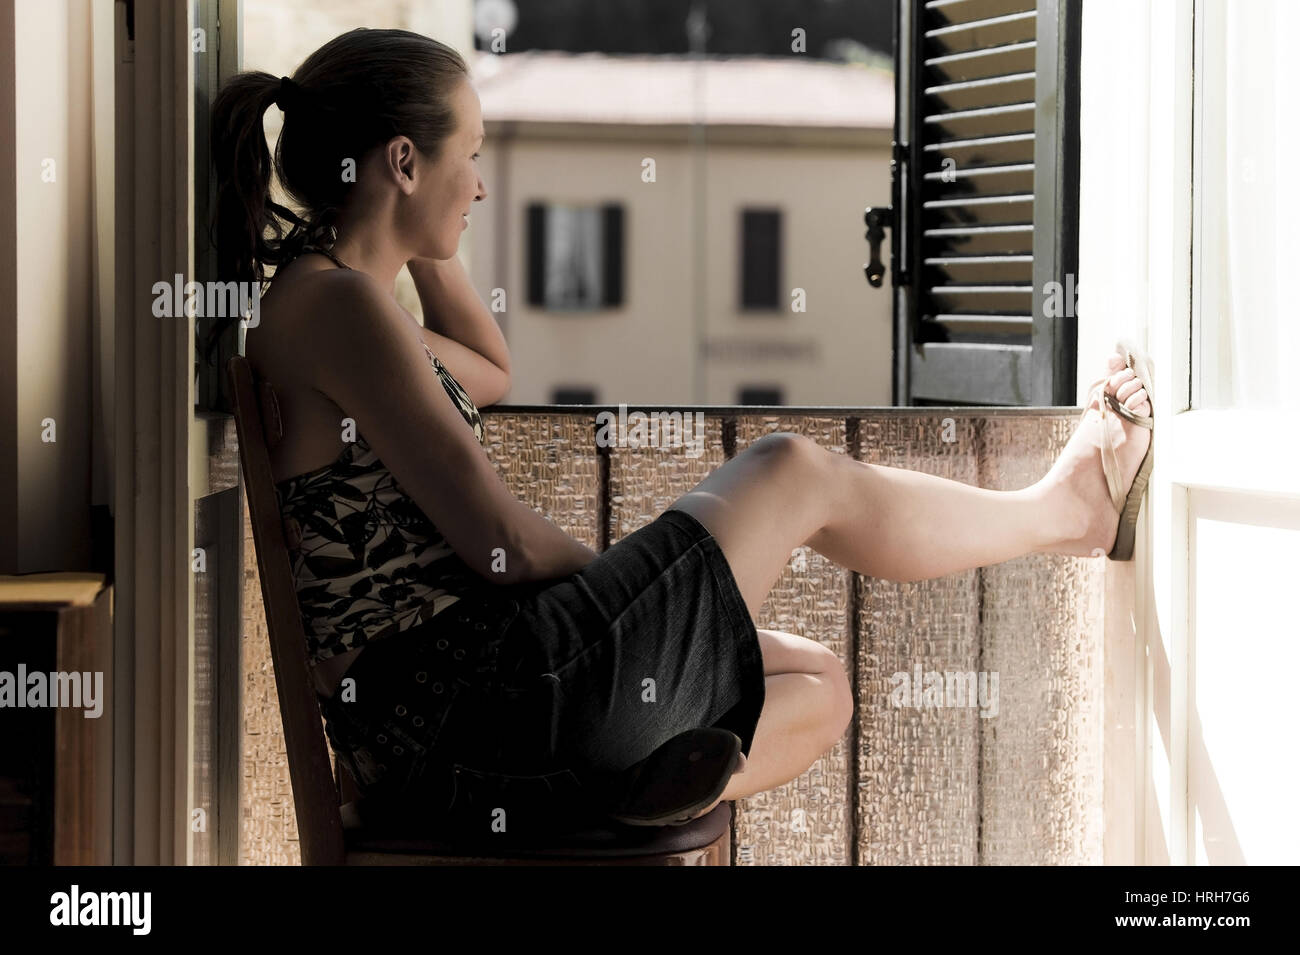 Model released, Junge Frau sitzt am Fenster - woman sitting front of a window Stock Photo